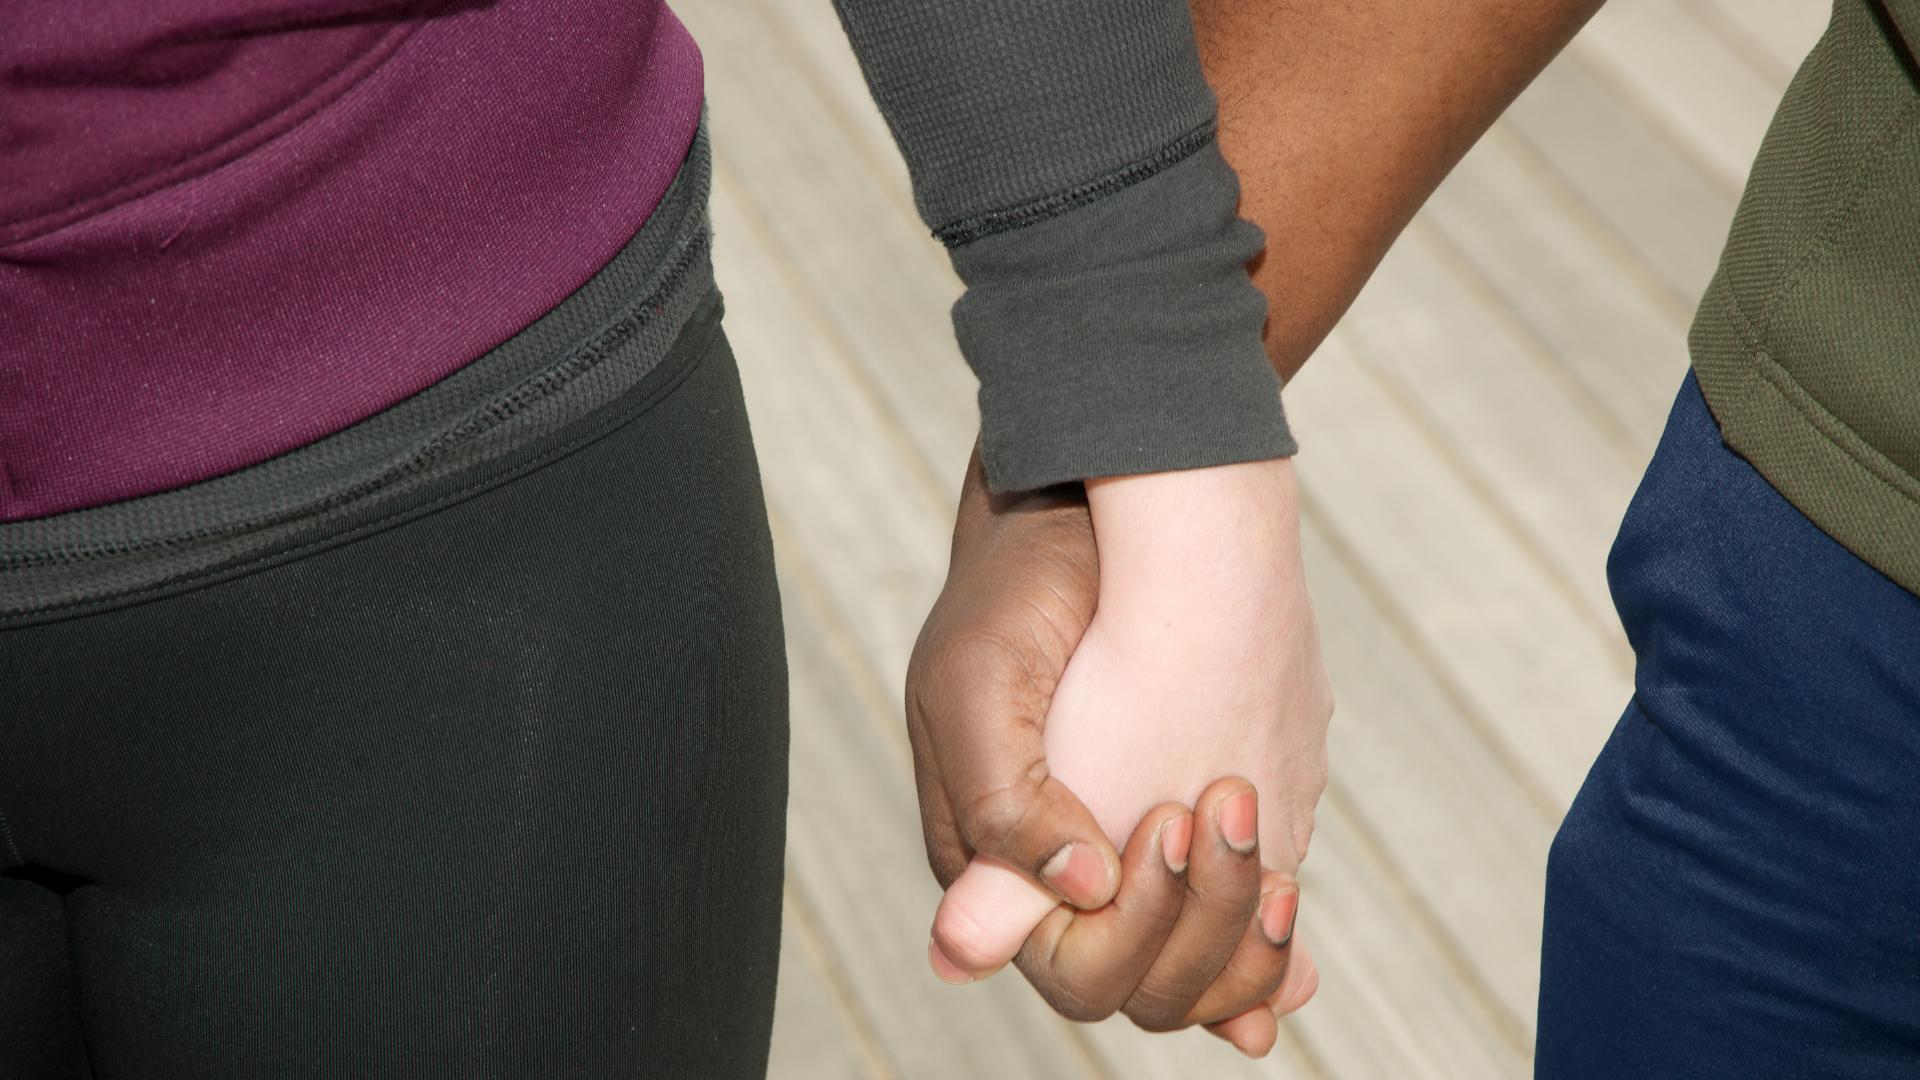 Eliminate Racial Discrimination